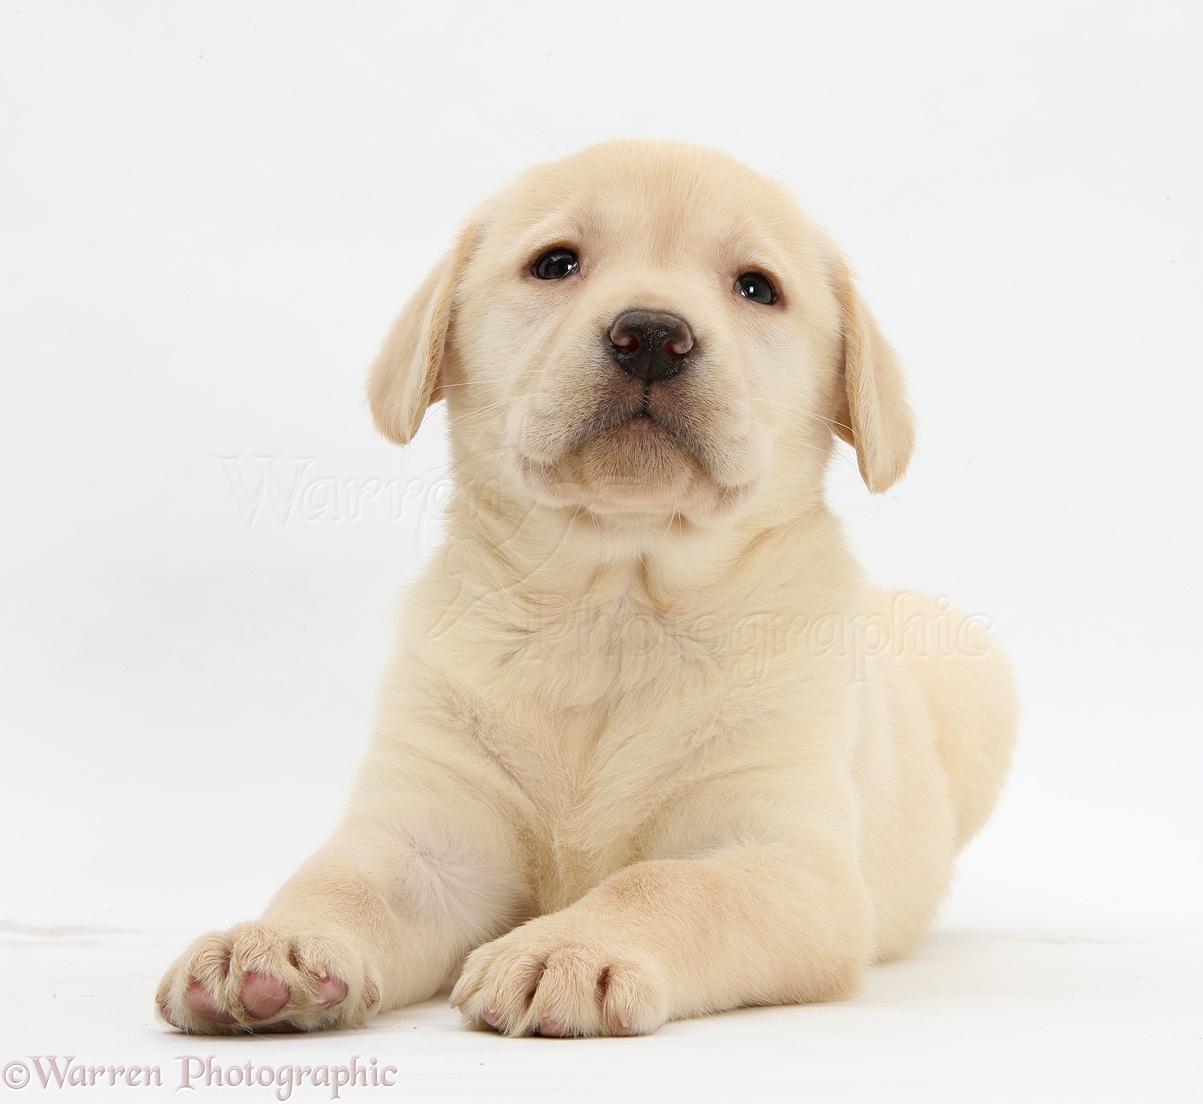 Dog yellow labrador retriever puppy 7 weeks old photo wp24917